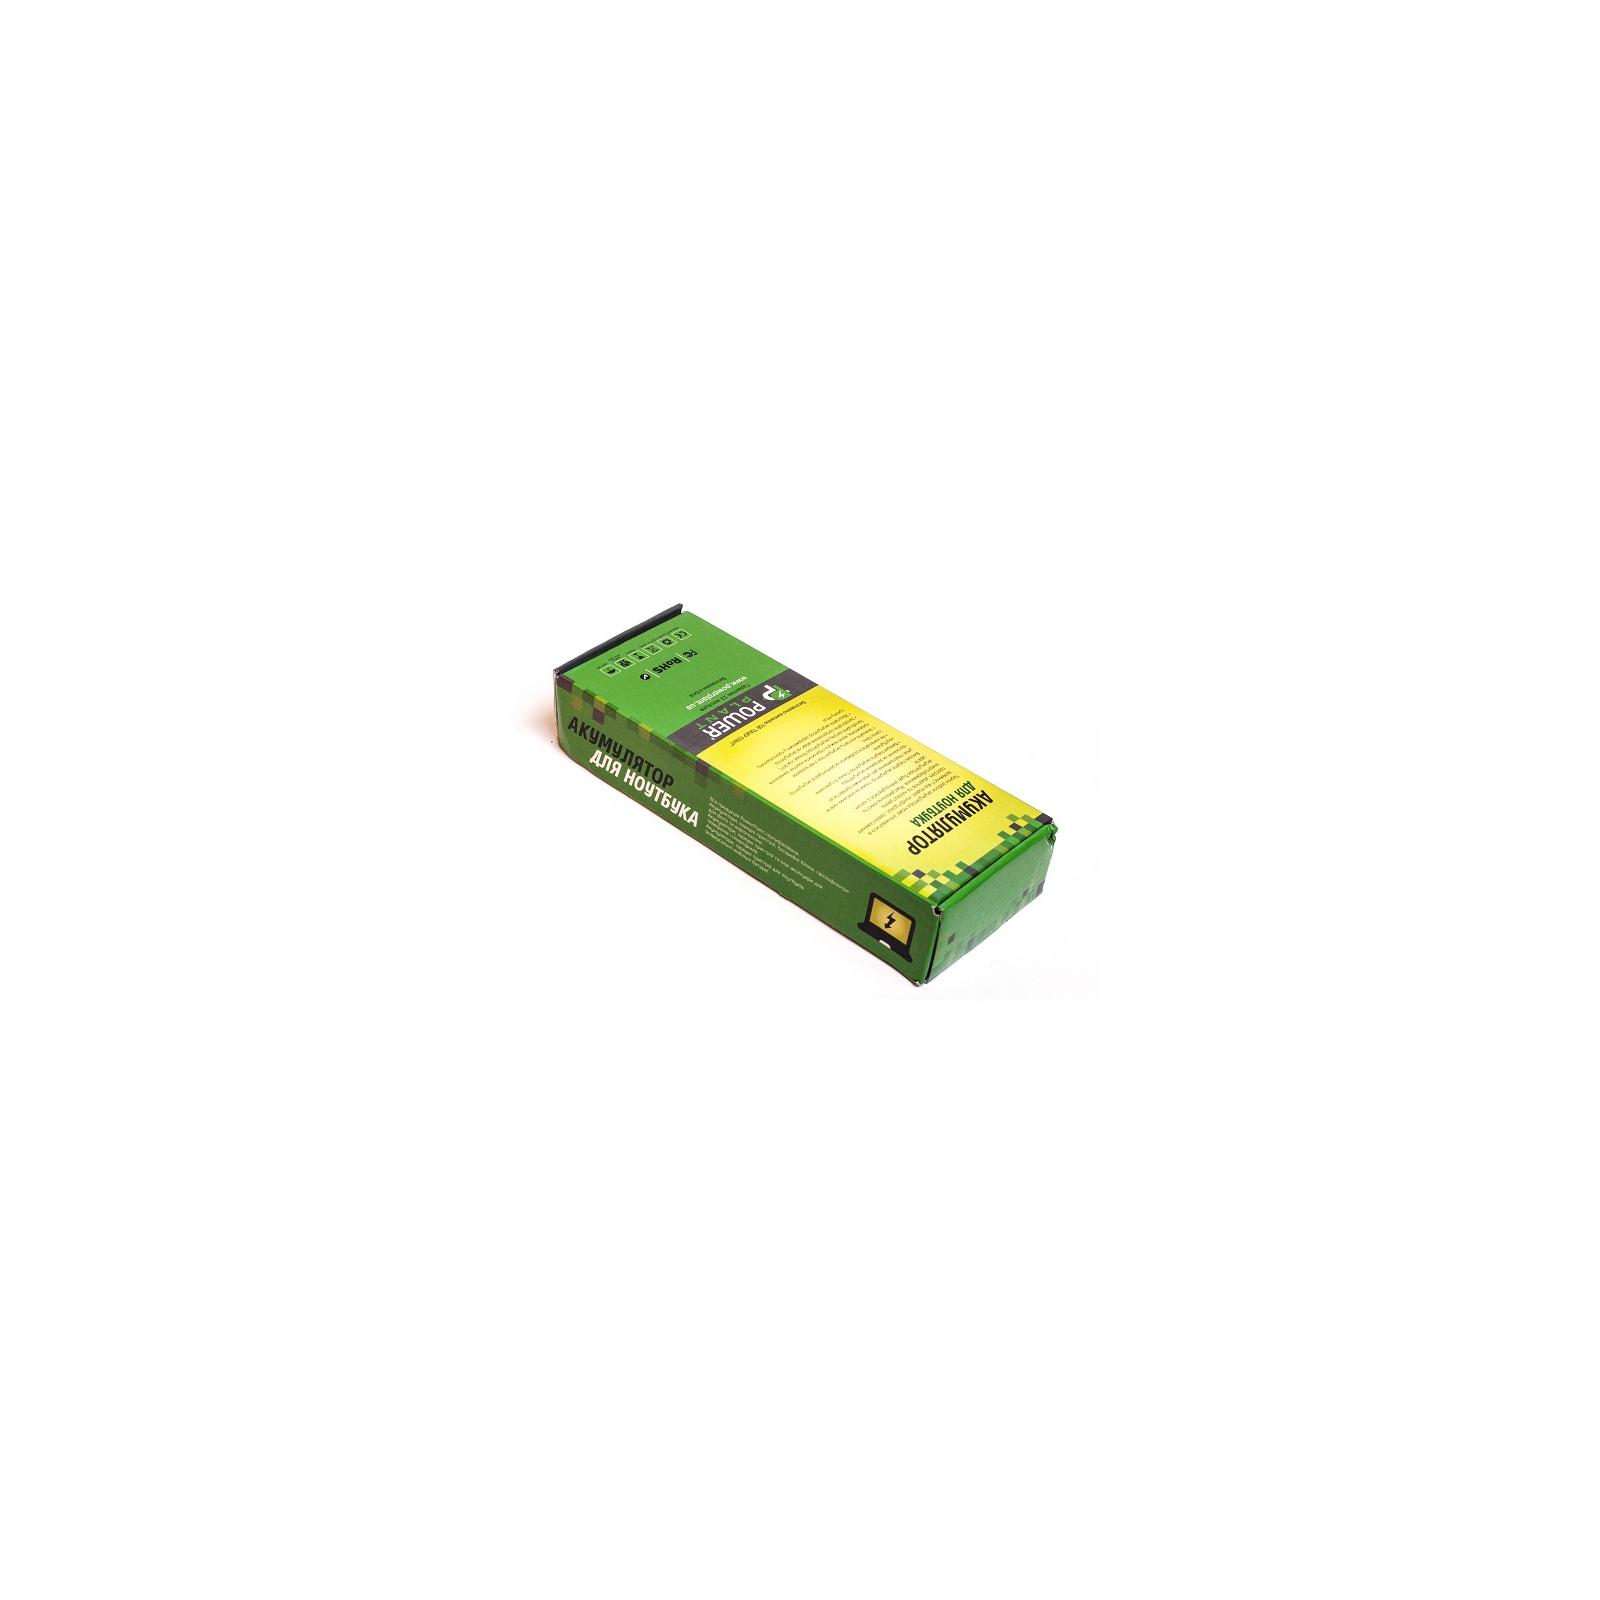 Аккумулятор для ноутбука HP 6720 (HSTNN-IB51, H6731 3S2P) 14.8V 5200mAh PowerPlant (NB00000148) изображение 2